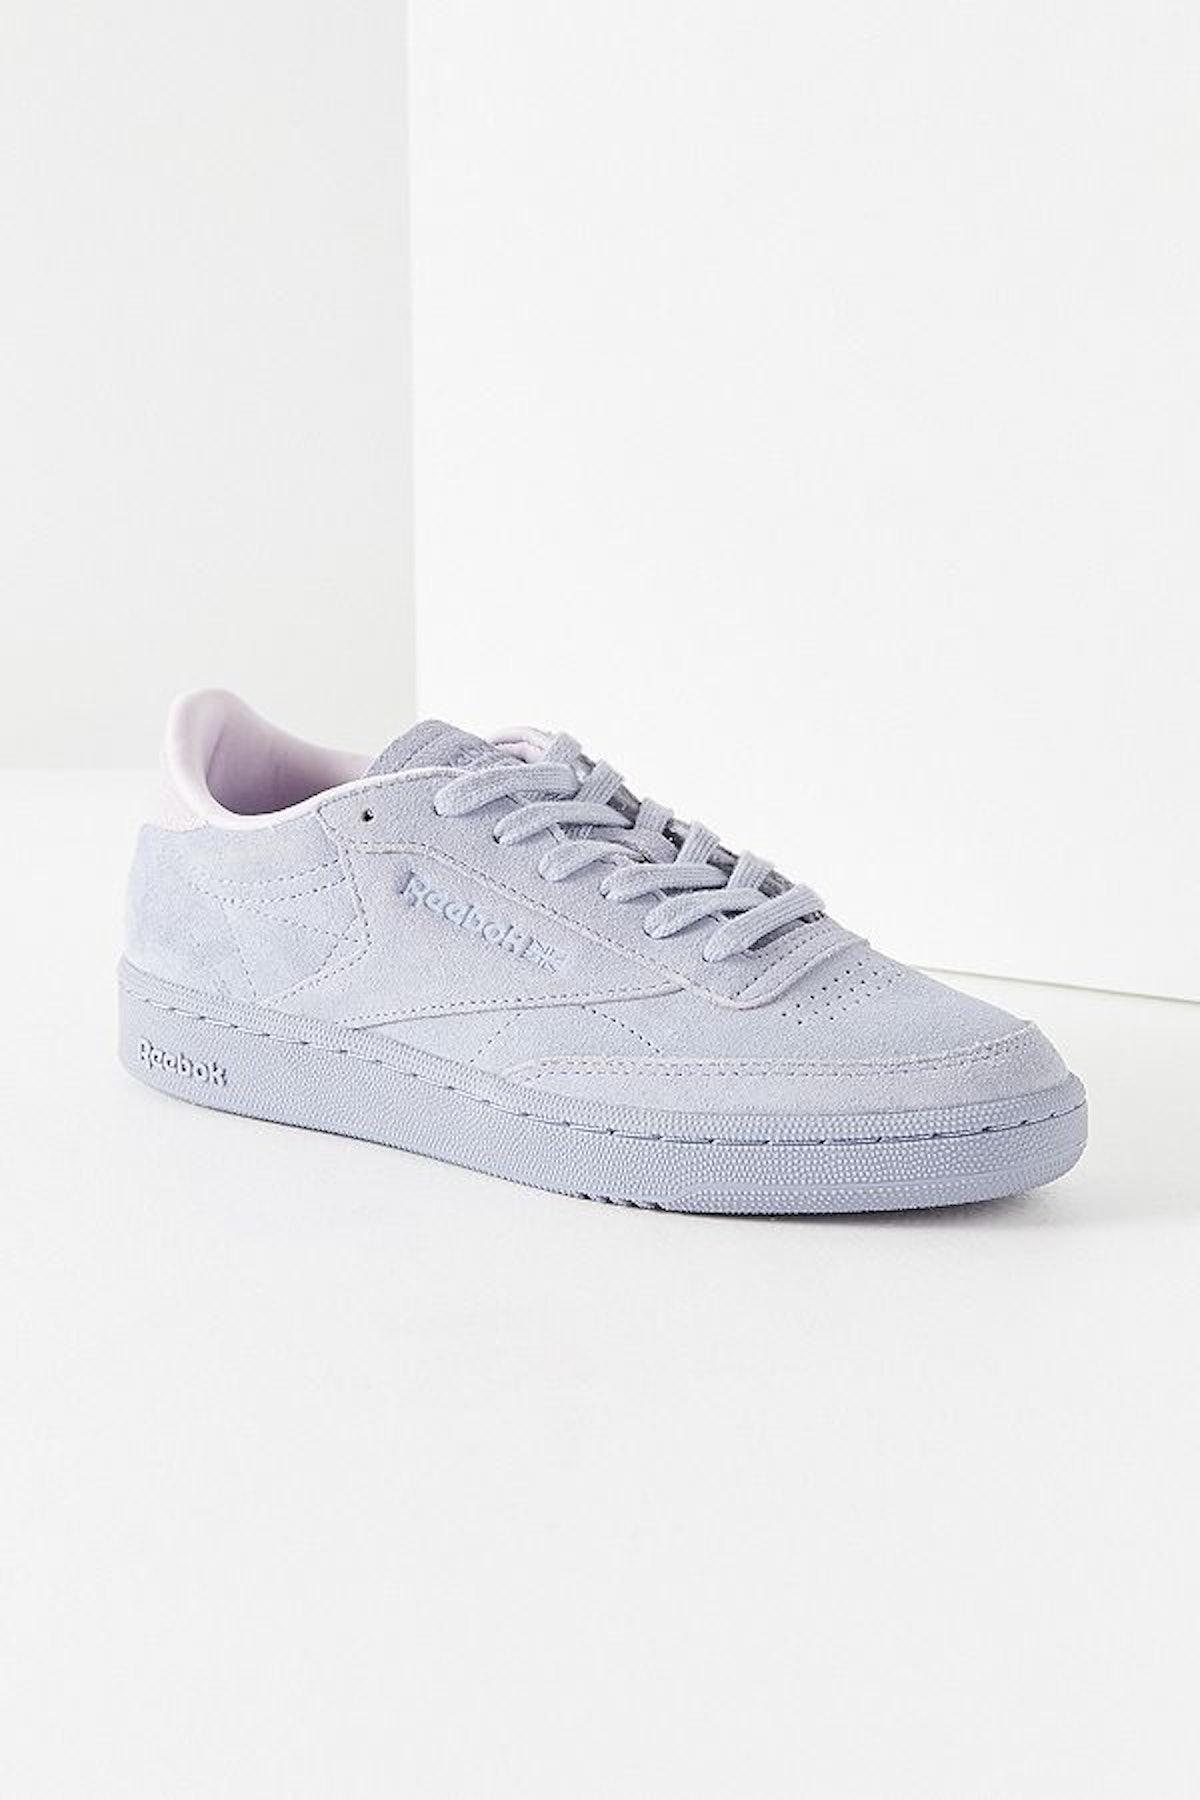 Reebok Club C 85 Nubuck Sneaker